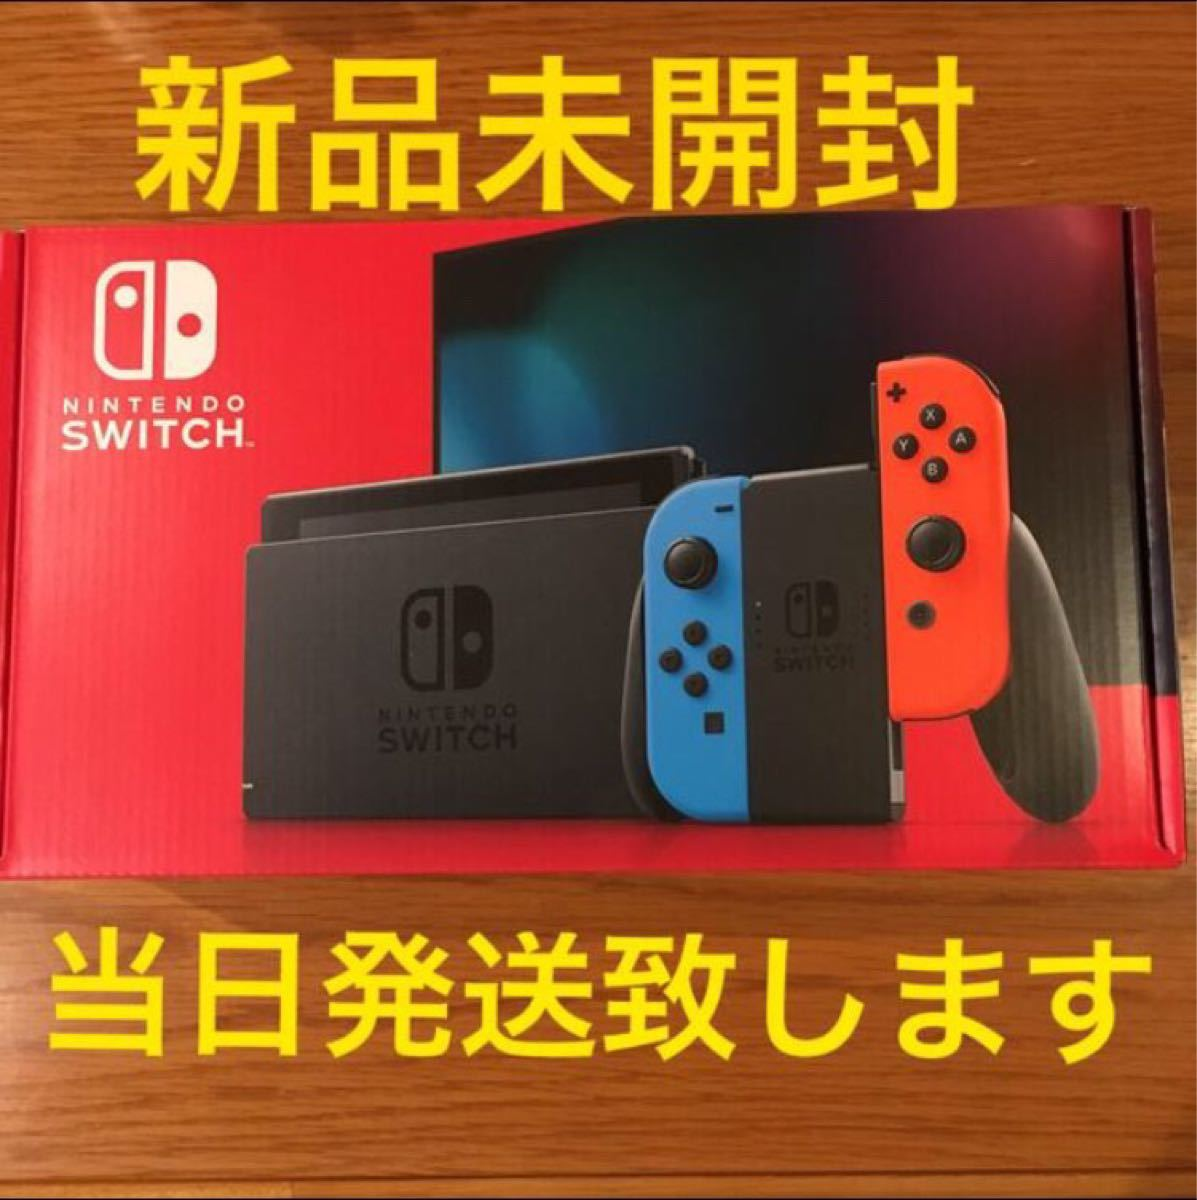 Nintendo Switch ニンテンドースイッチ本体 ネオンブルー ネオンカラー 任天堂